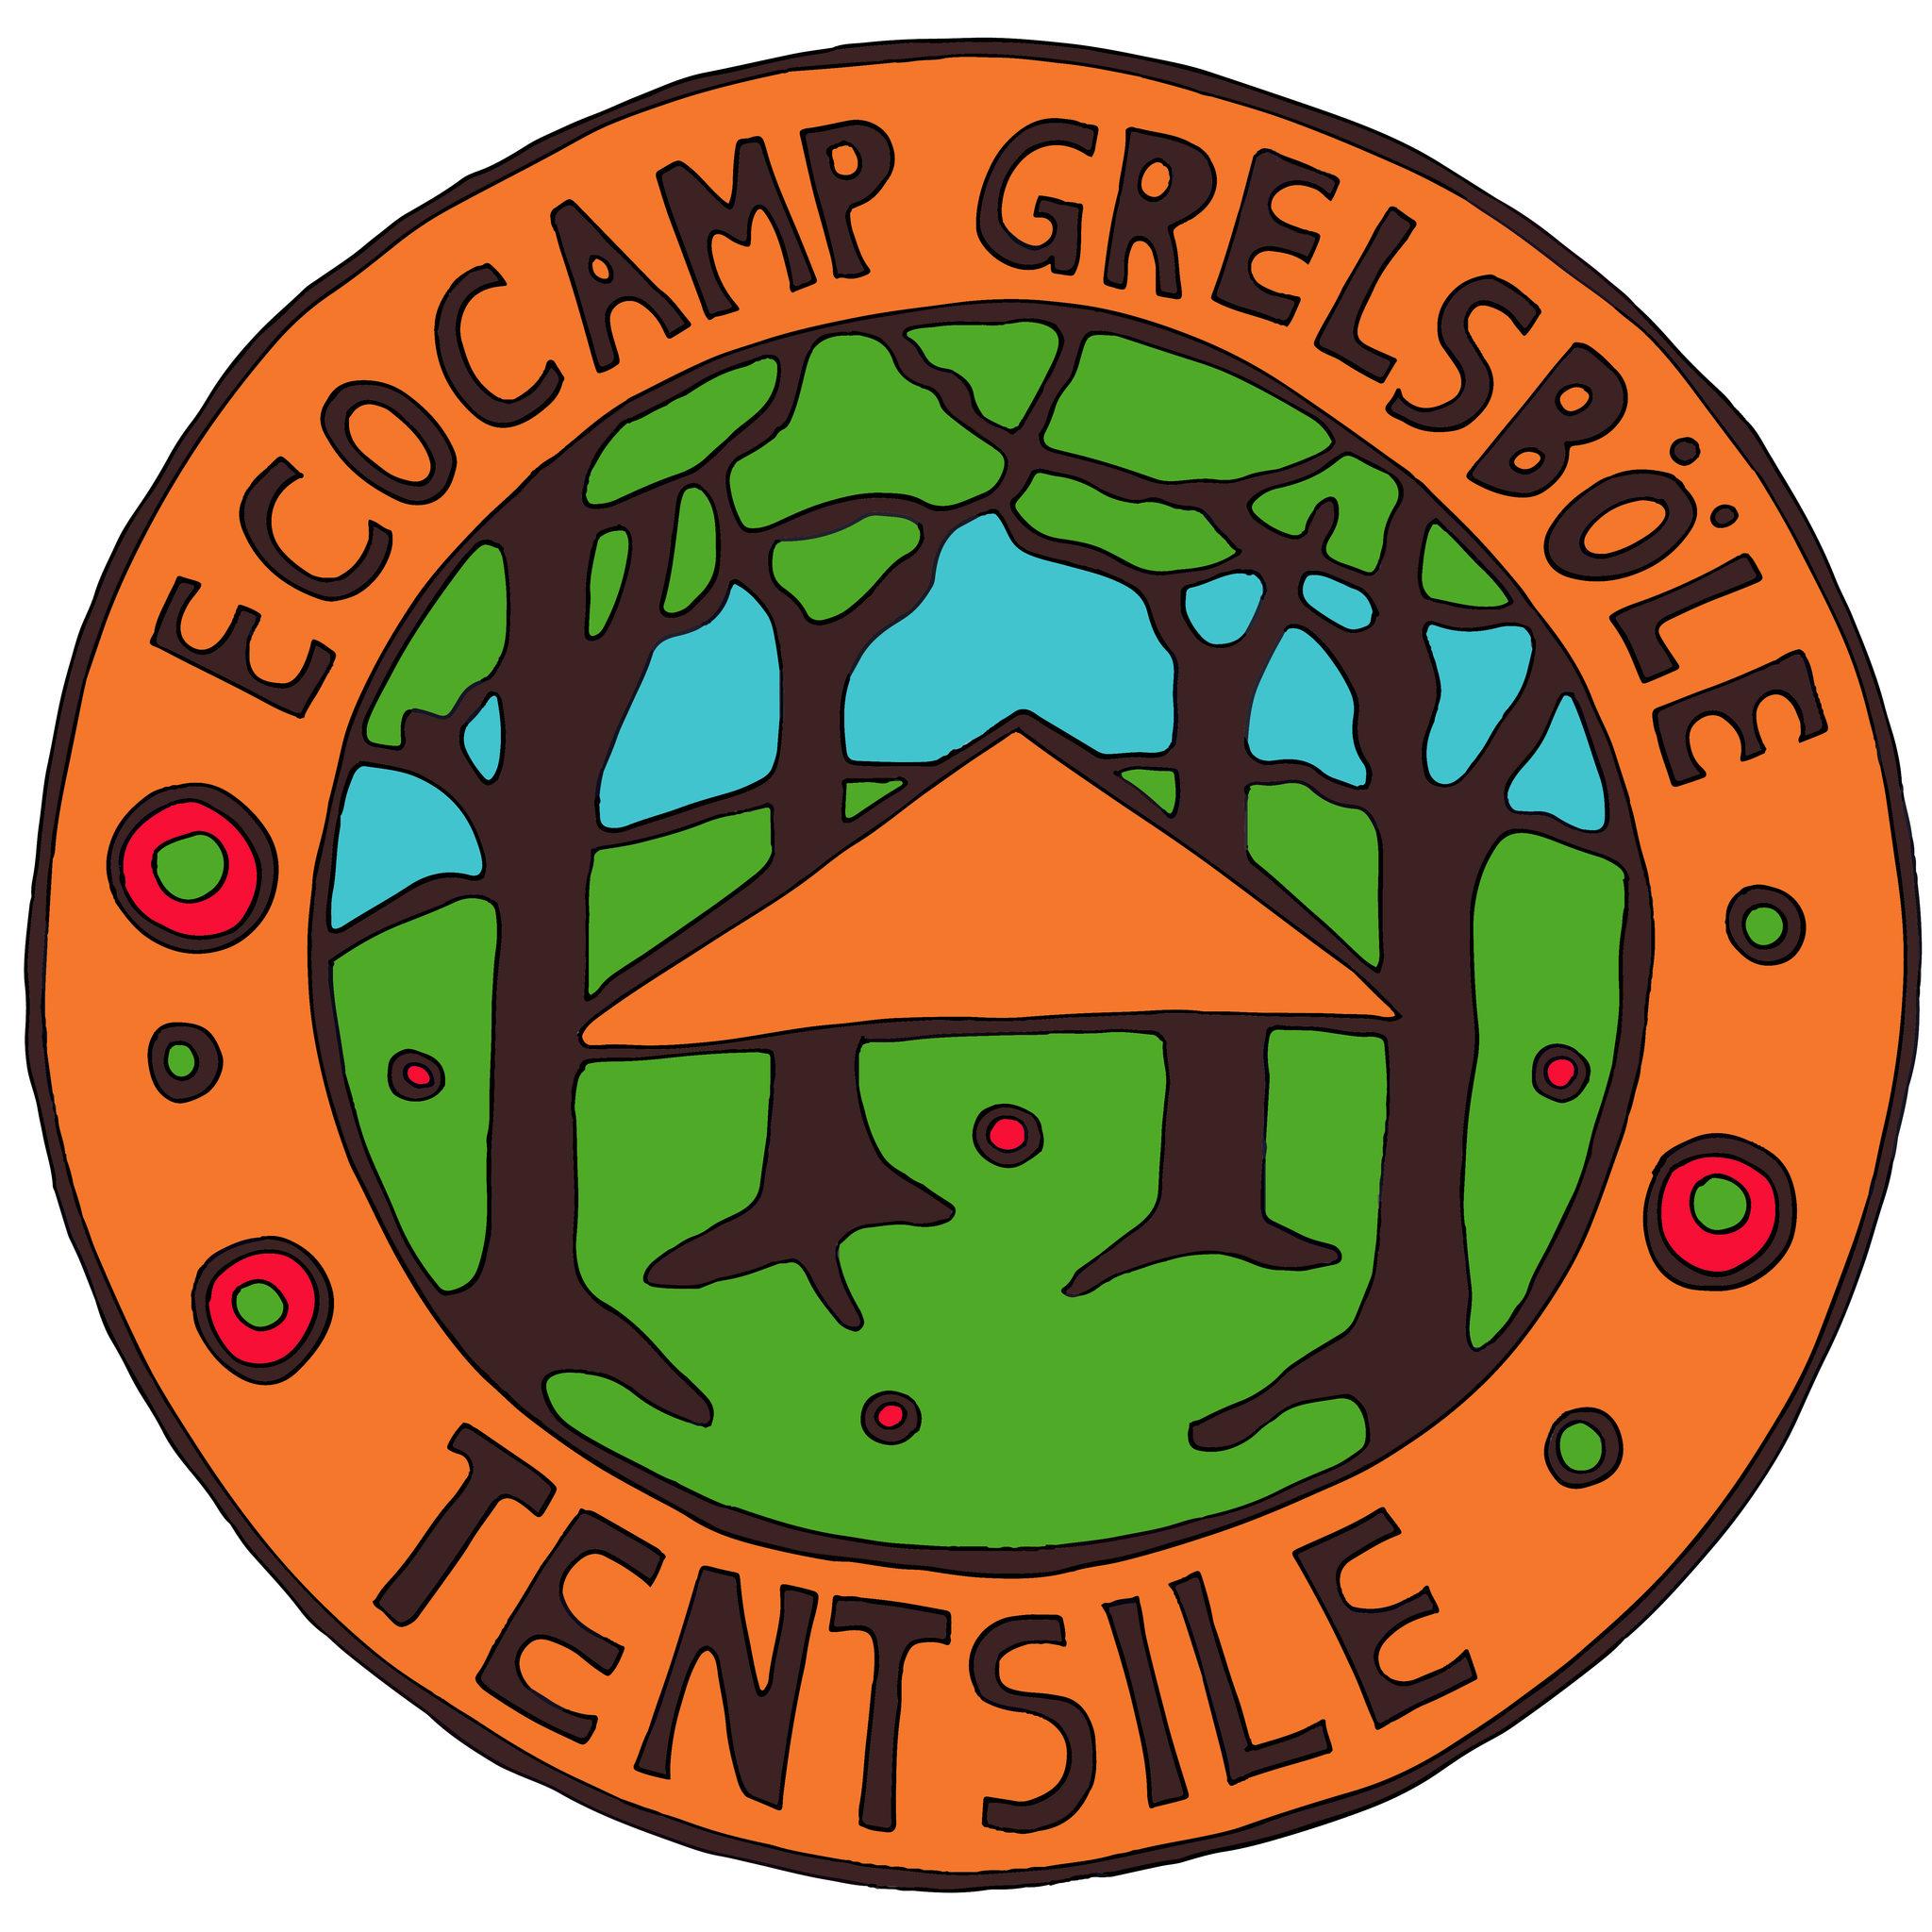 Tentsile Ecocamp Grelsböle logo